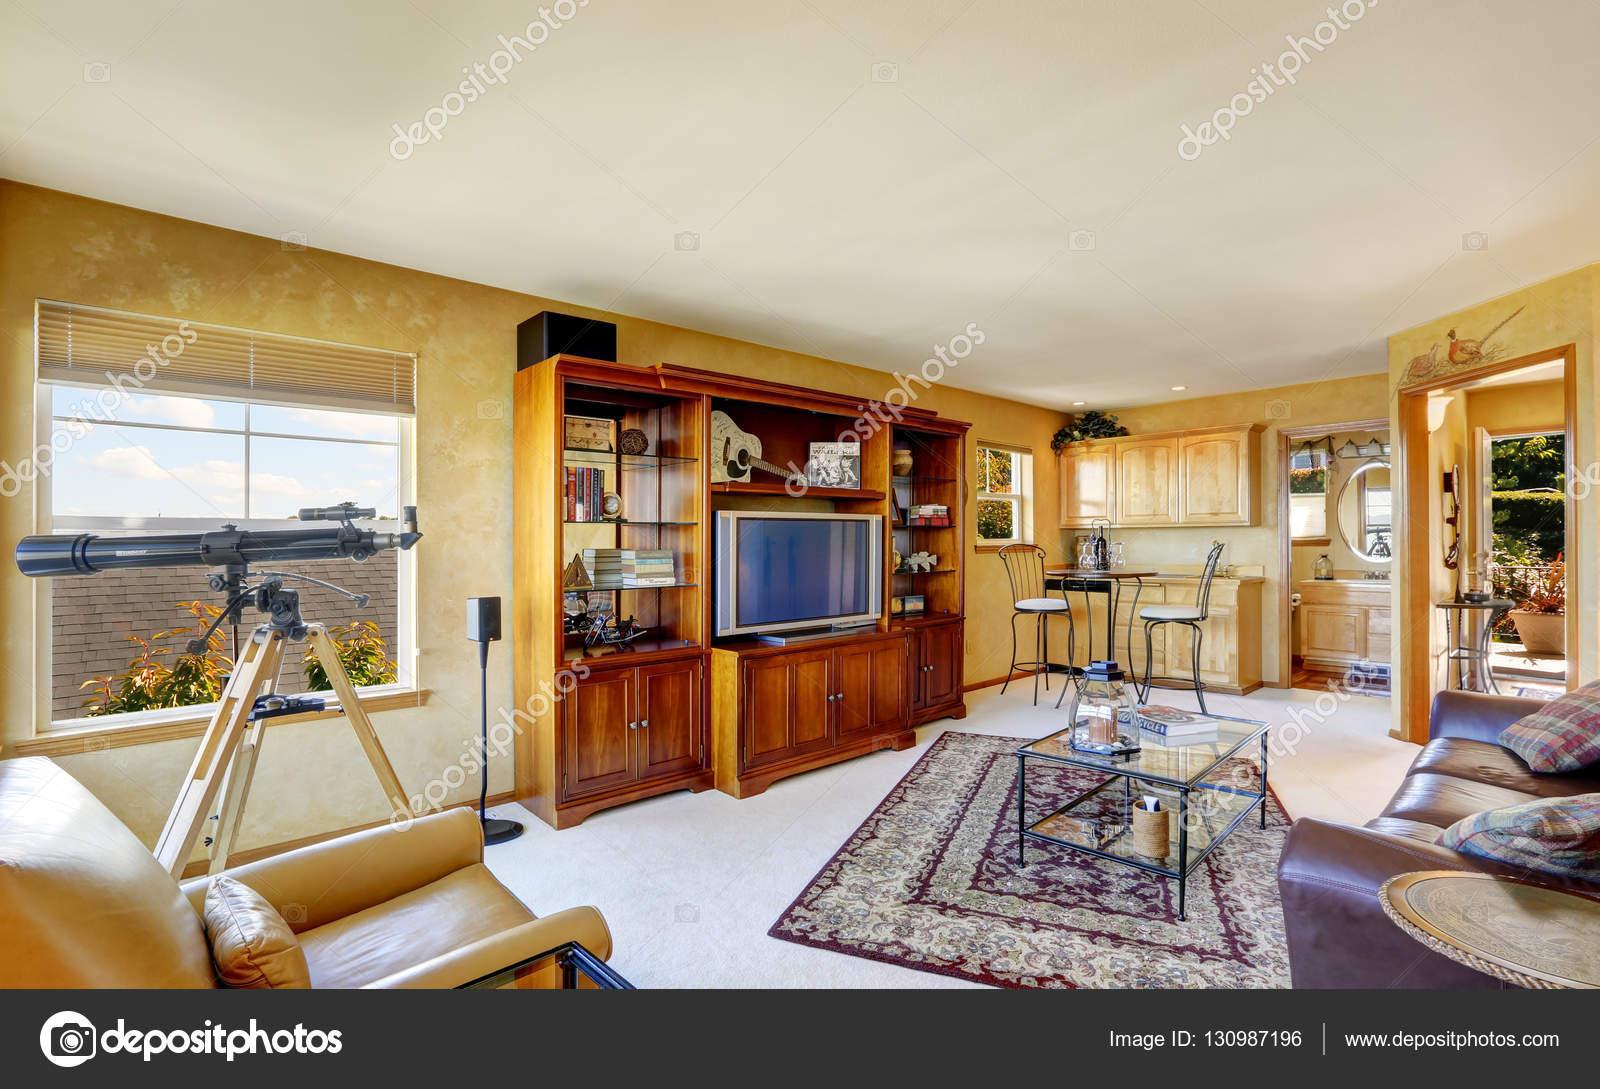 Compacte Woonkamer Inrichting : Compacte woonkamer interieur in duplex huis u stockfoto